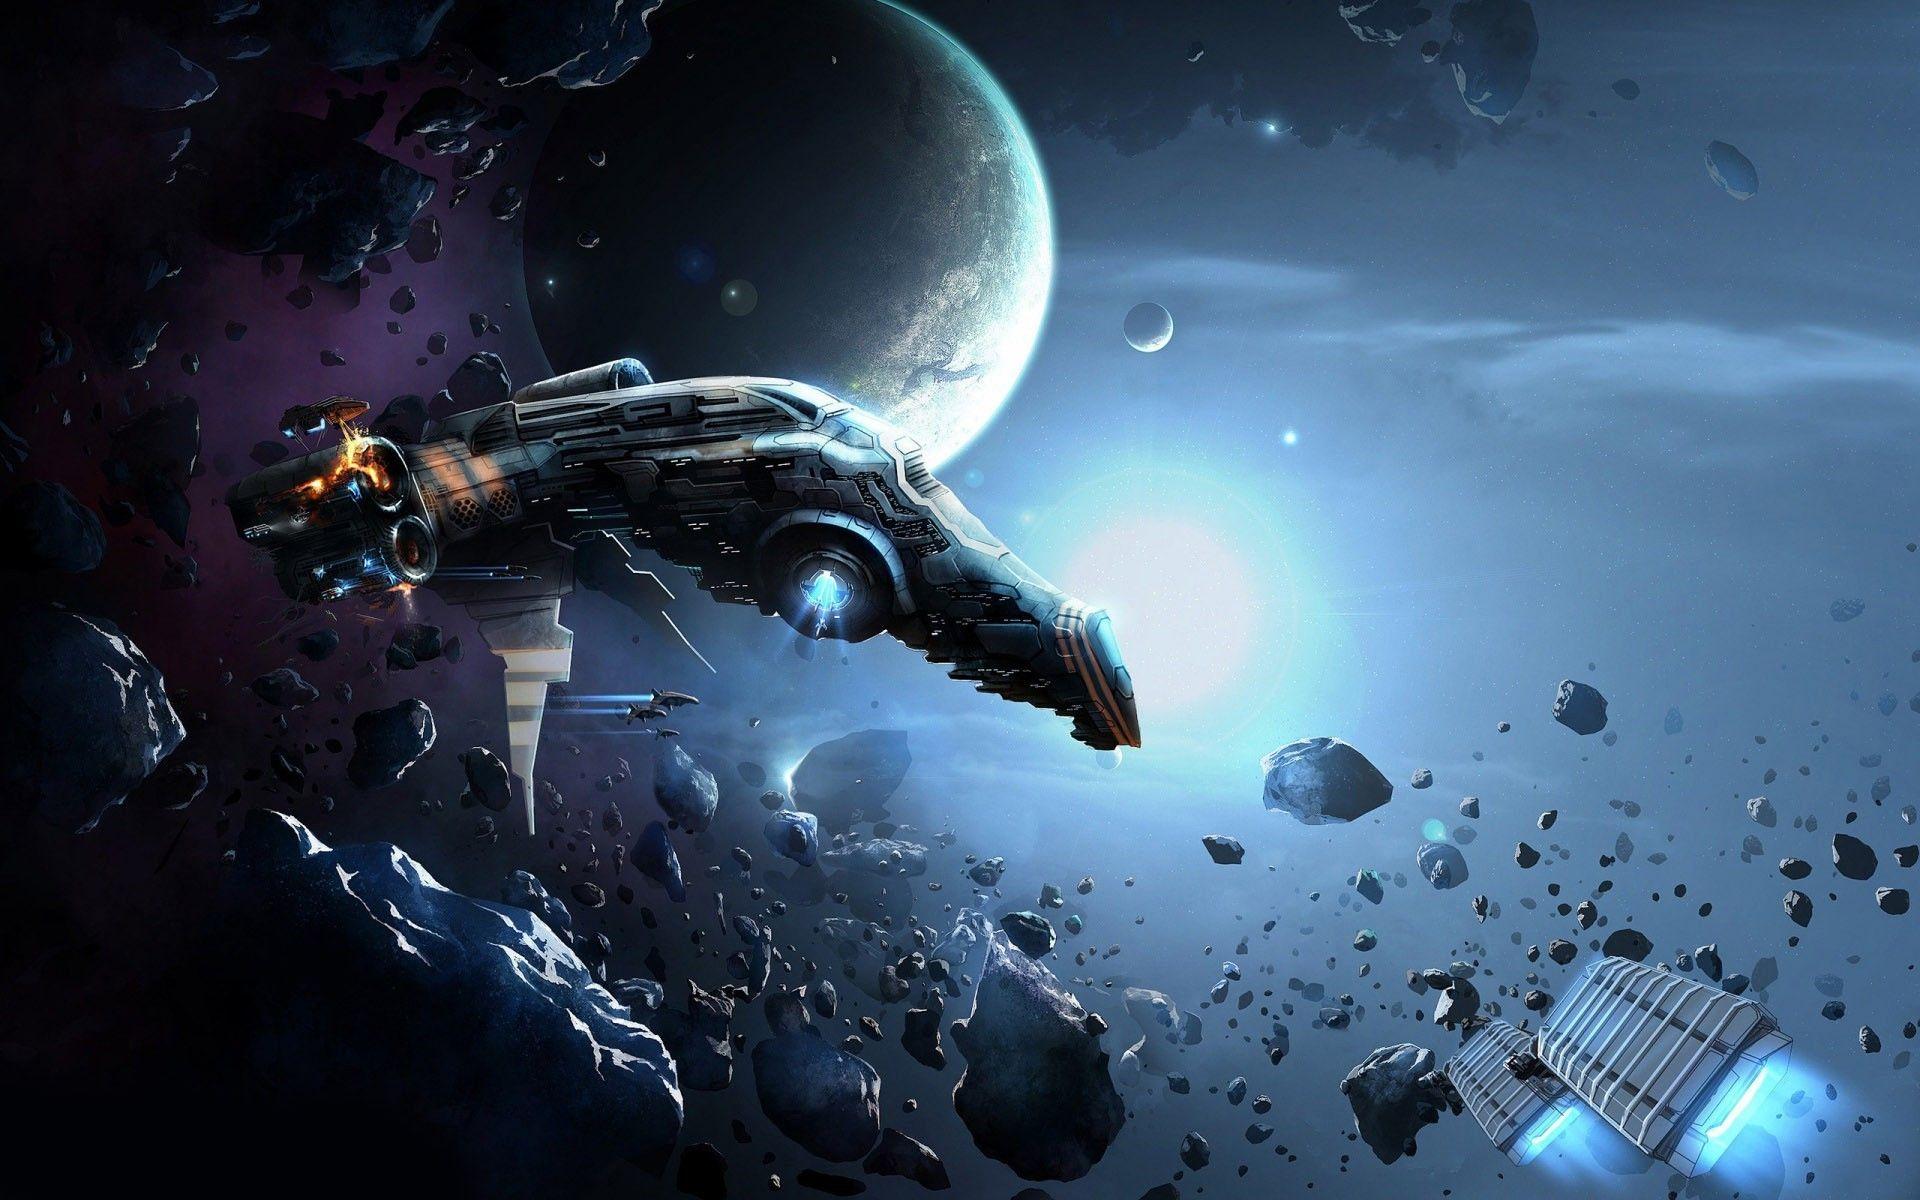 spaceship background picture wallpaper 2k1d0cxr space